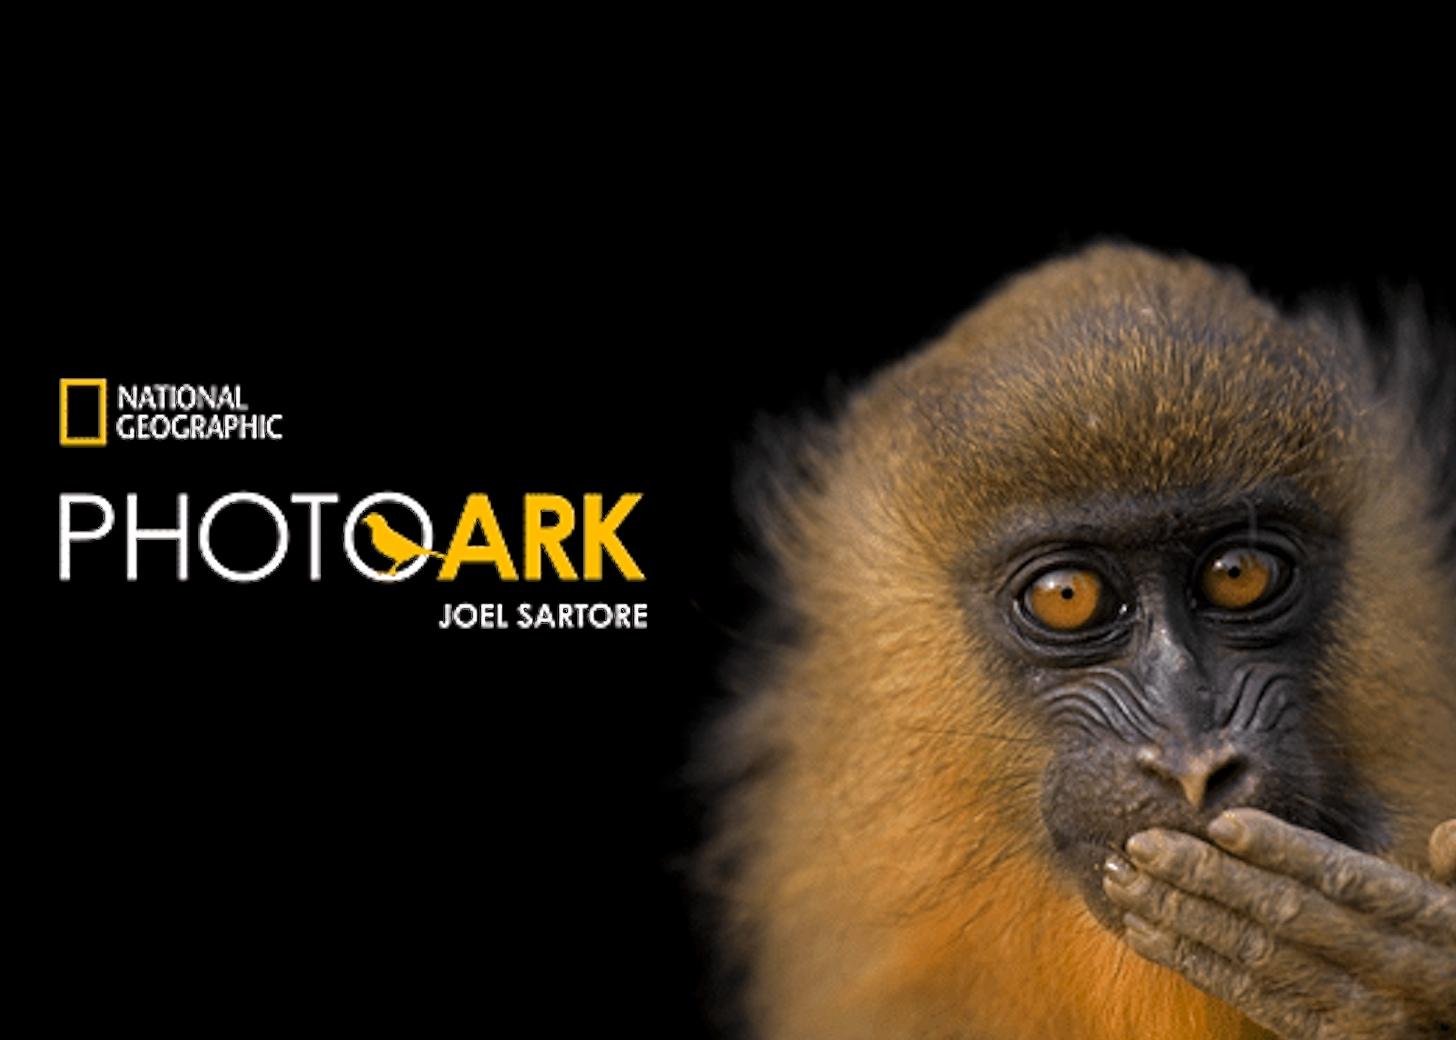 ©Joel Sartore-National Geographic/Photo Ark